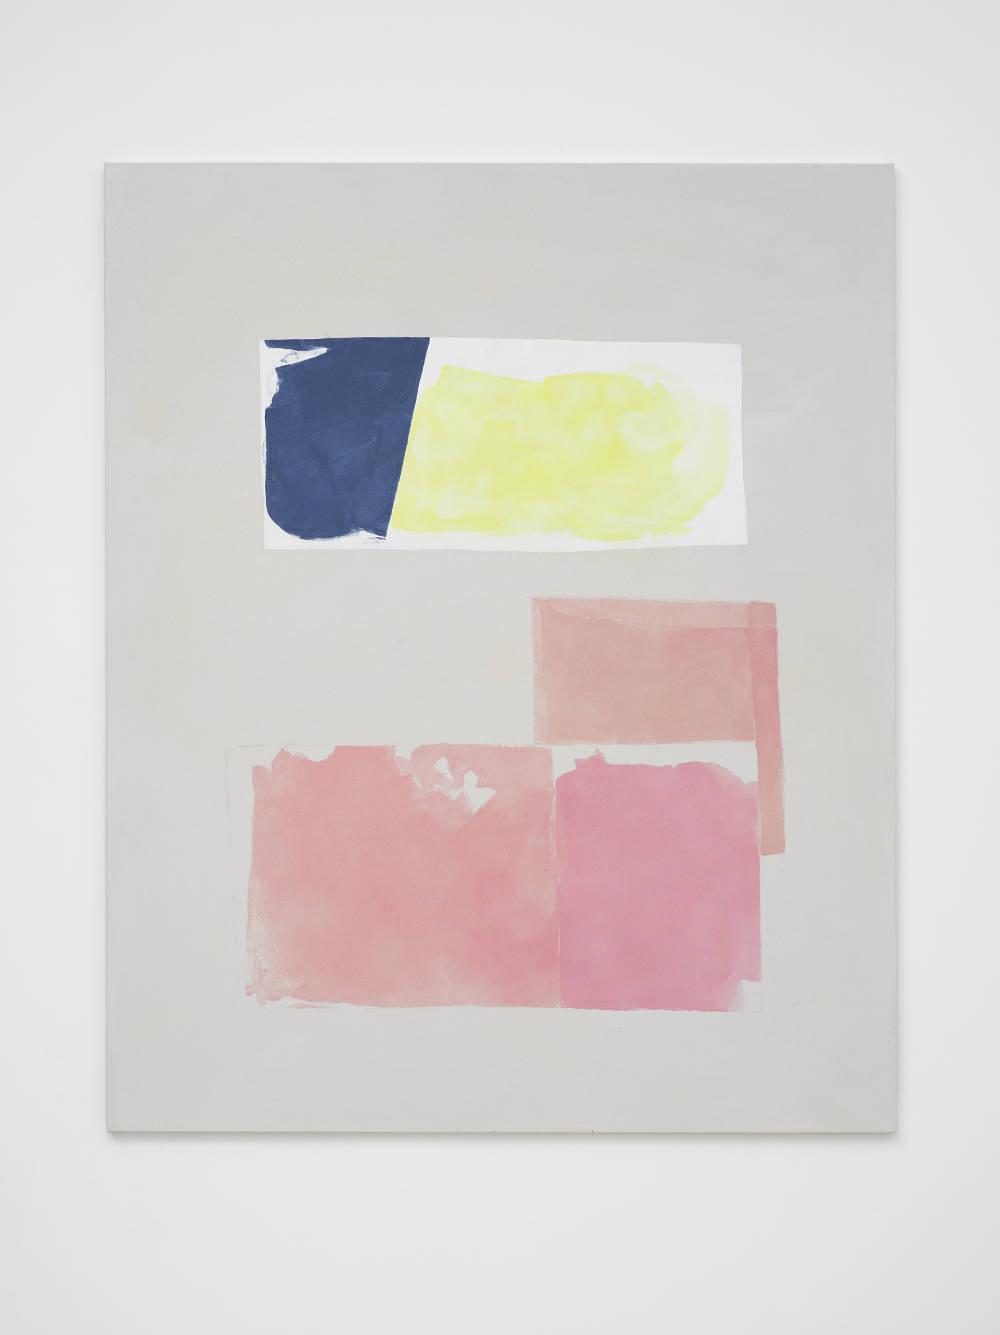 Peter Joseph, Dark Blue, Lemon and Pink, 2017. Acrylic on cotton duck 54 x 44 inches (137.2 x 111.8 cm) © Peter Joseph; Courtesy Lisson Gallery. Photo by Jack Hems